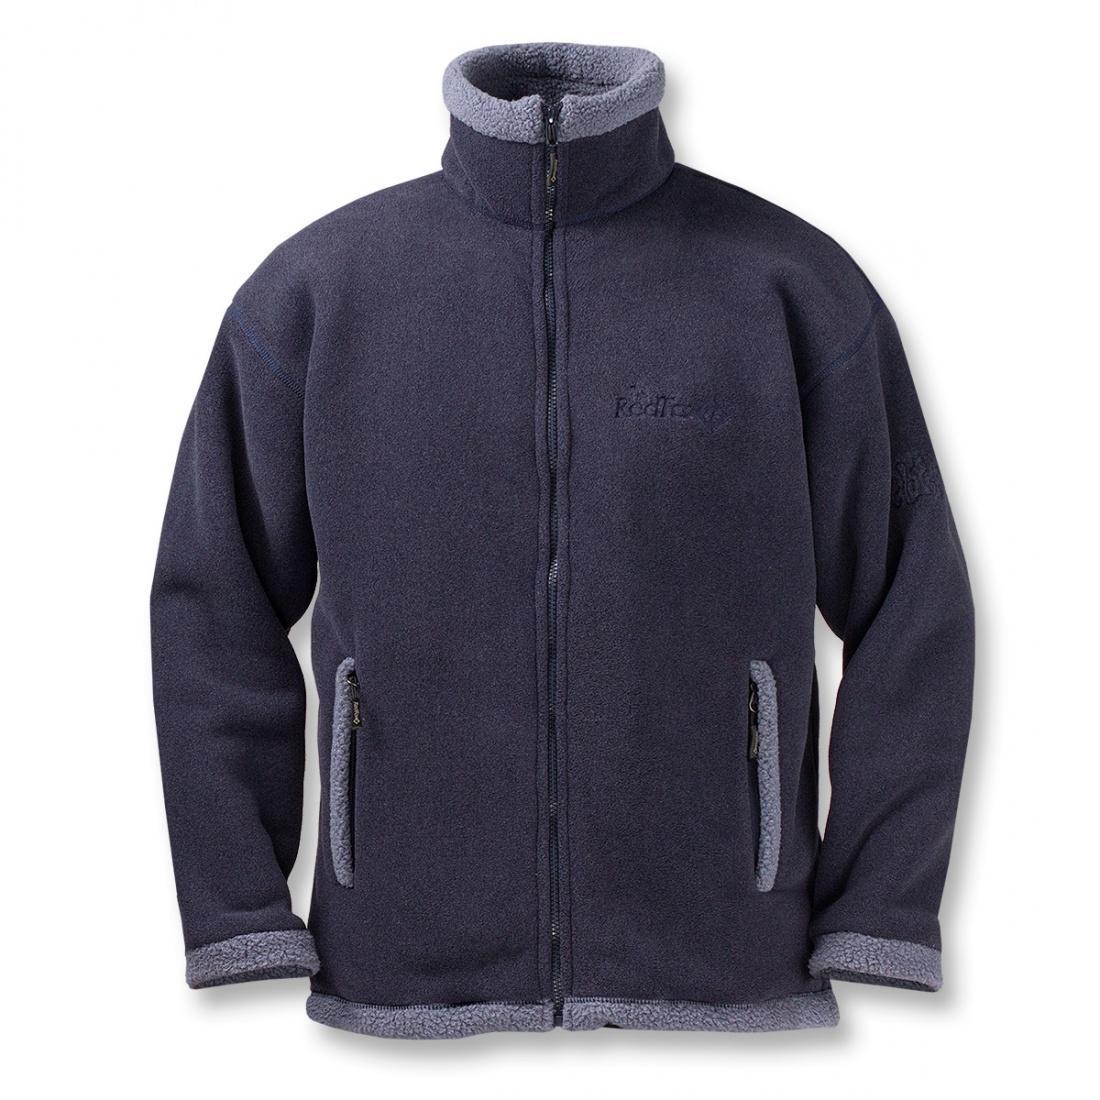 Куртка Cliff МужскаяКуртки<br><br><br>Цвет: Синий<br>Размер: 56